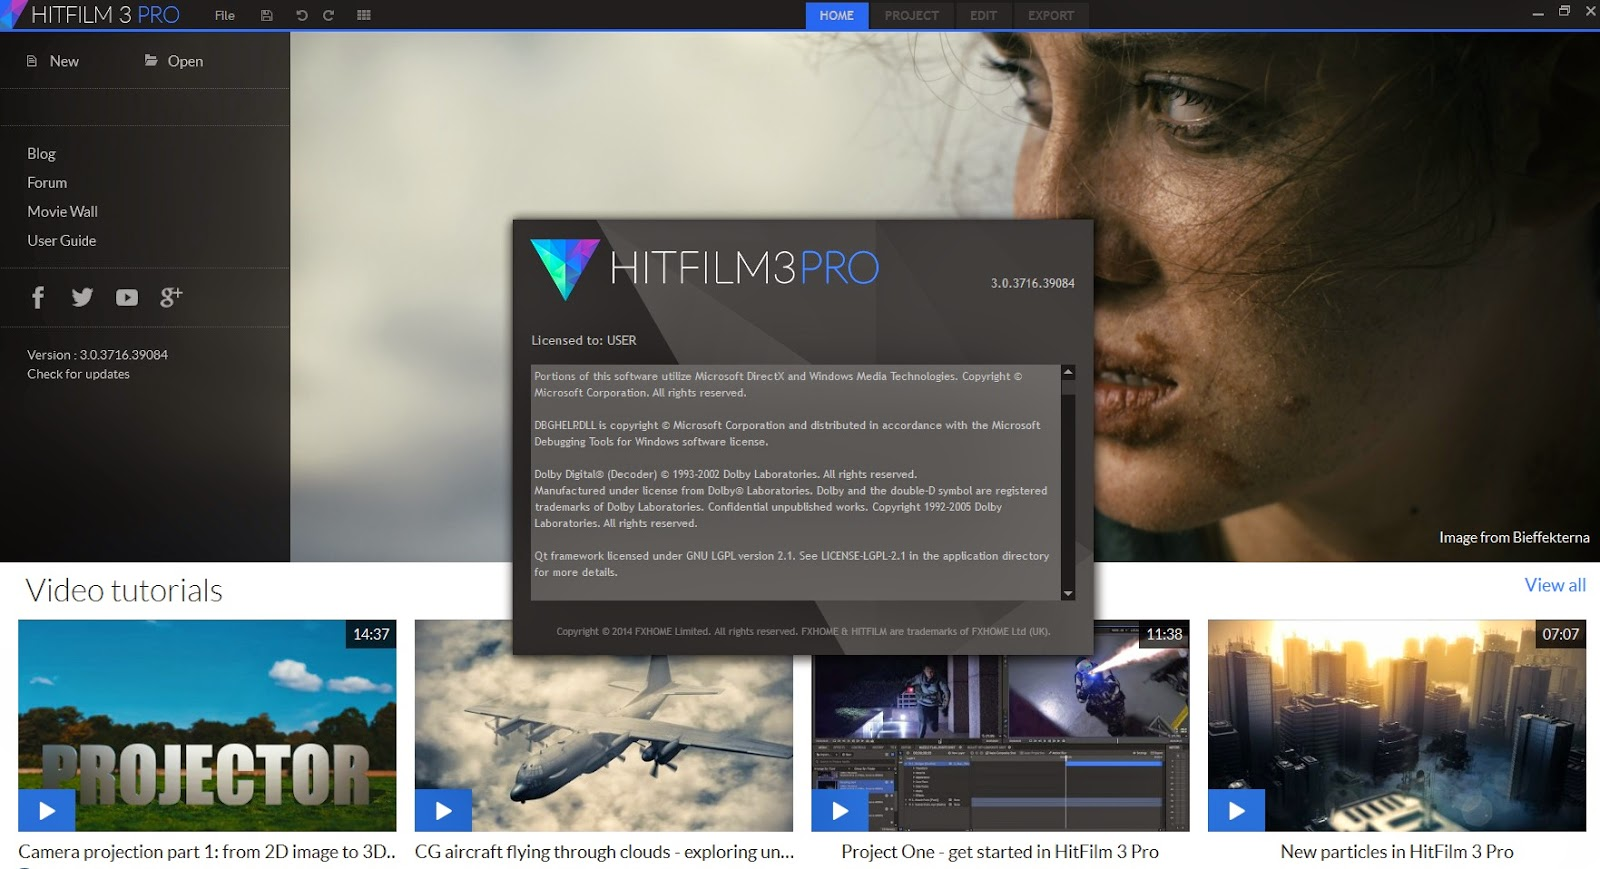 hitfilm 3 pro free download 32 bit